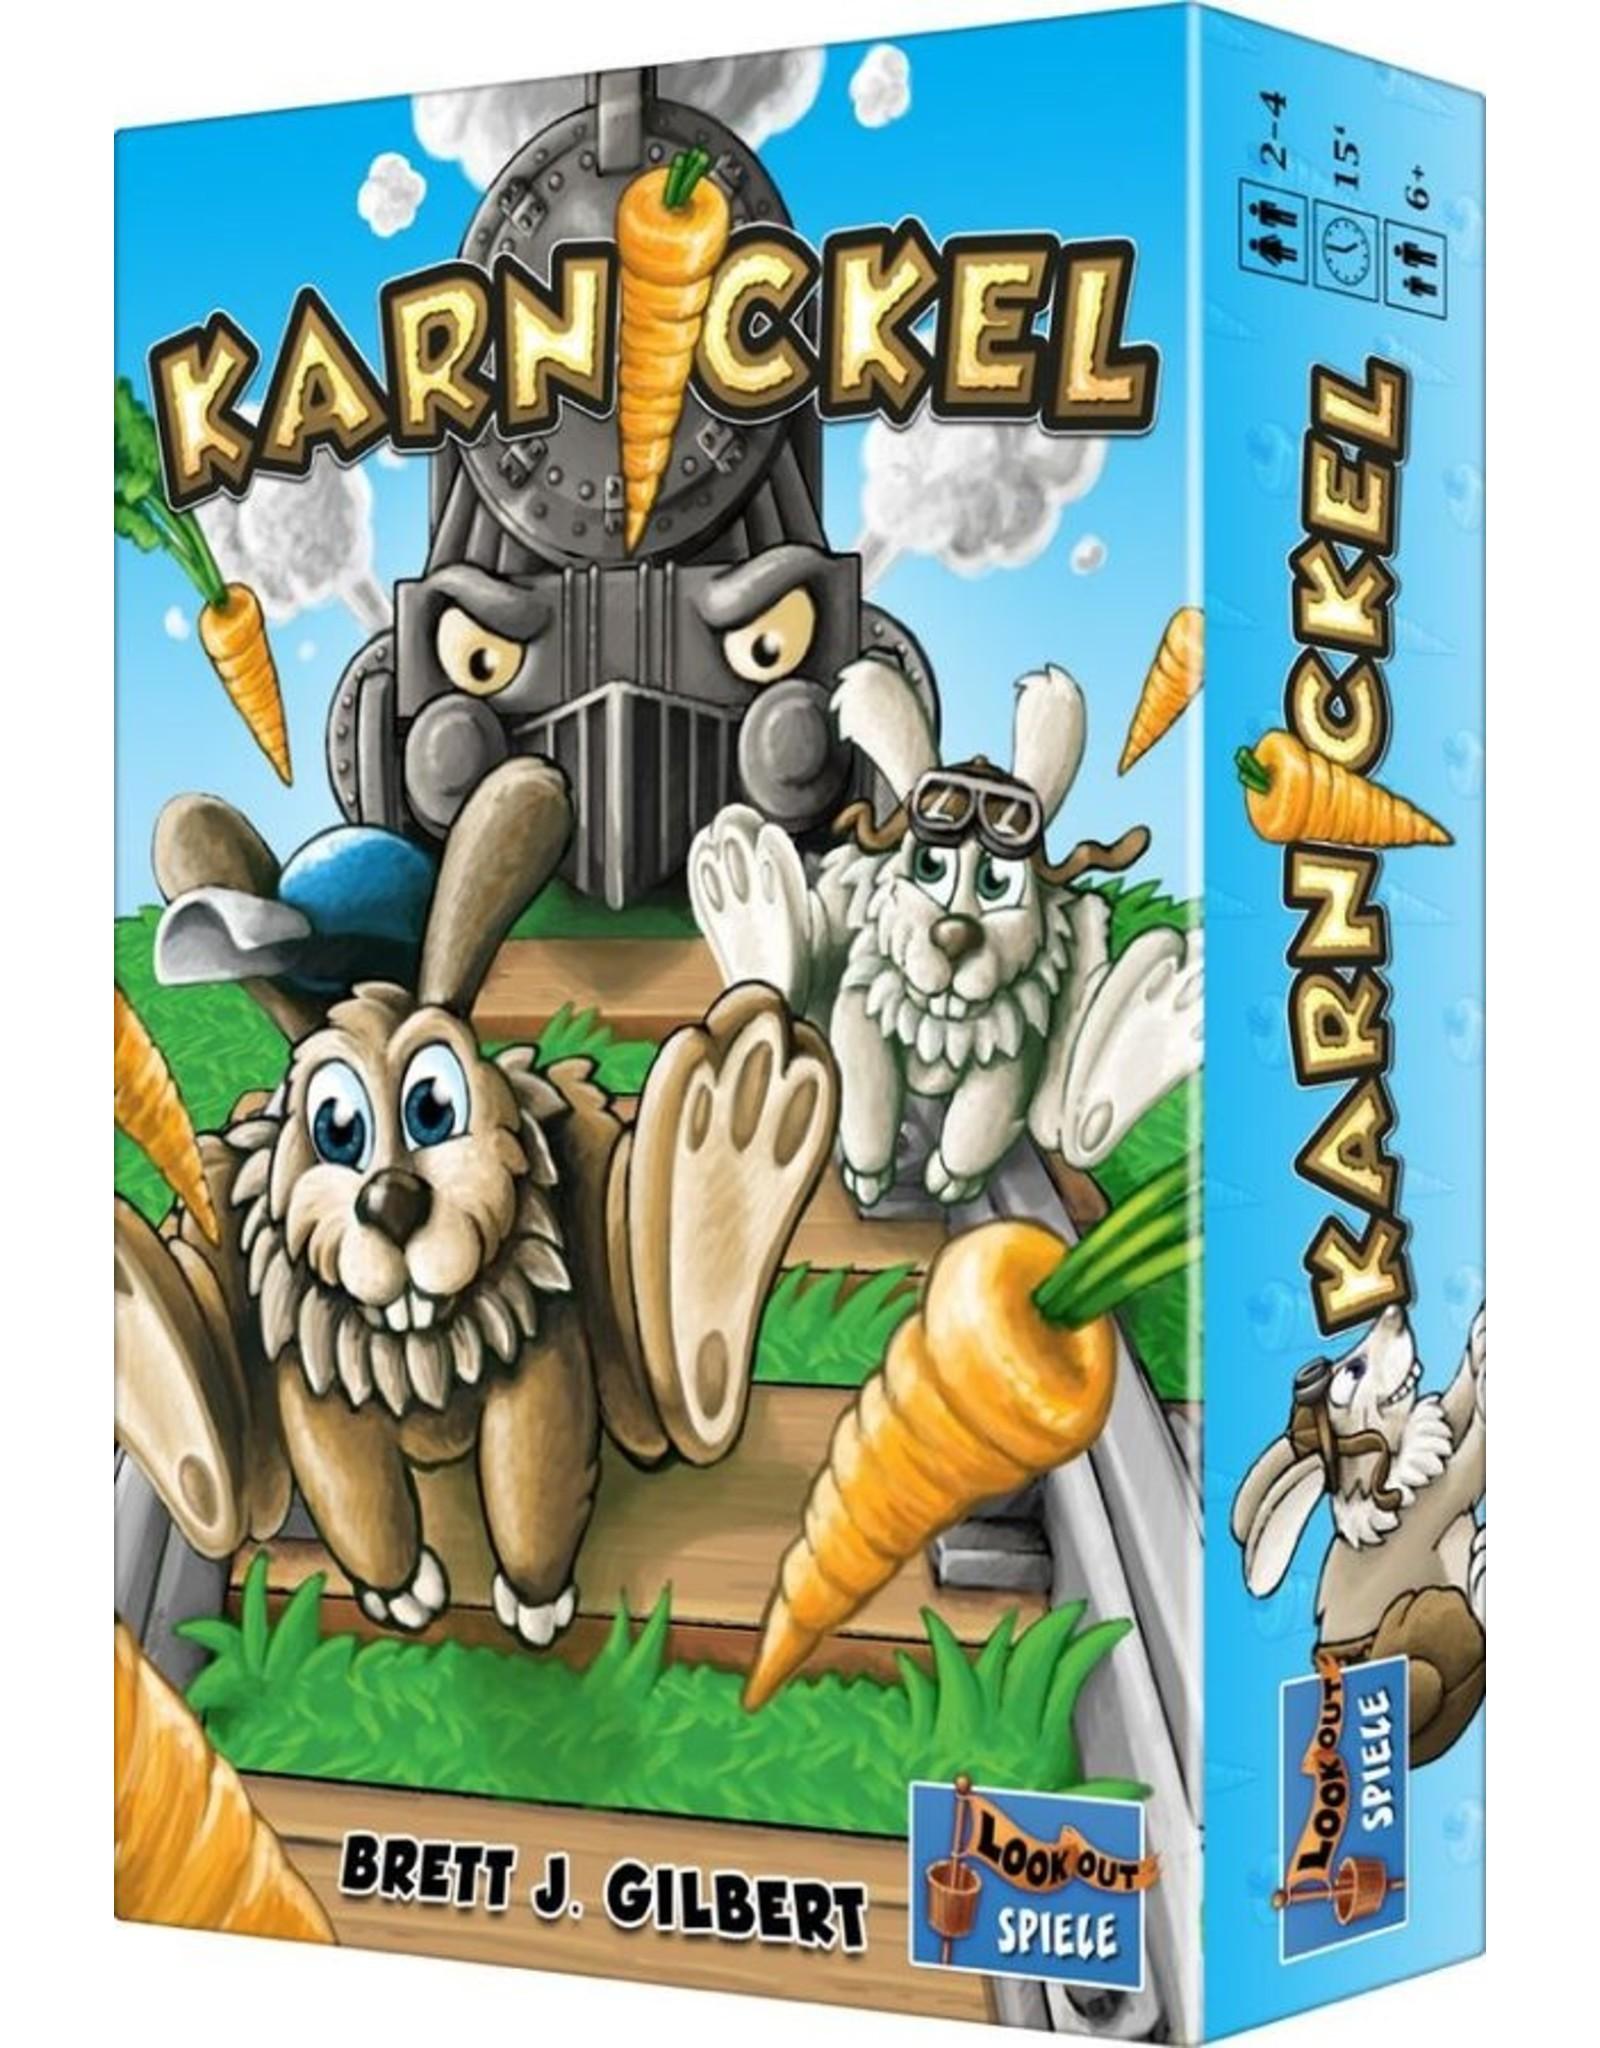 Lookout Games Karnickel